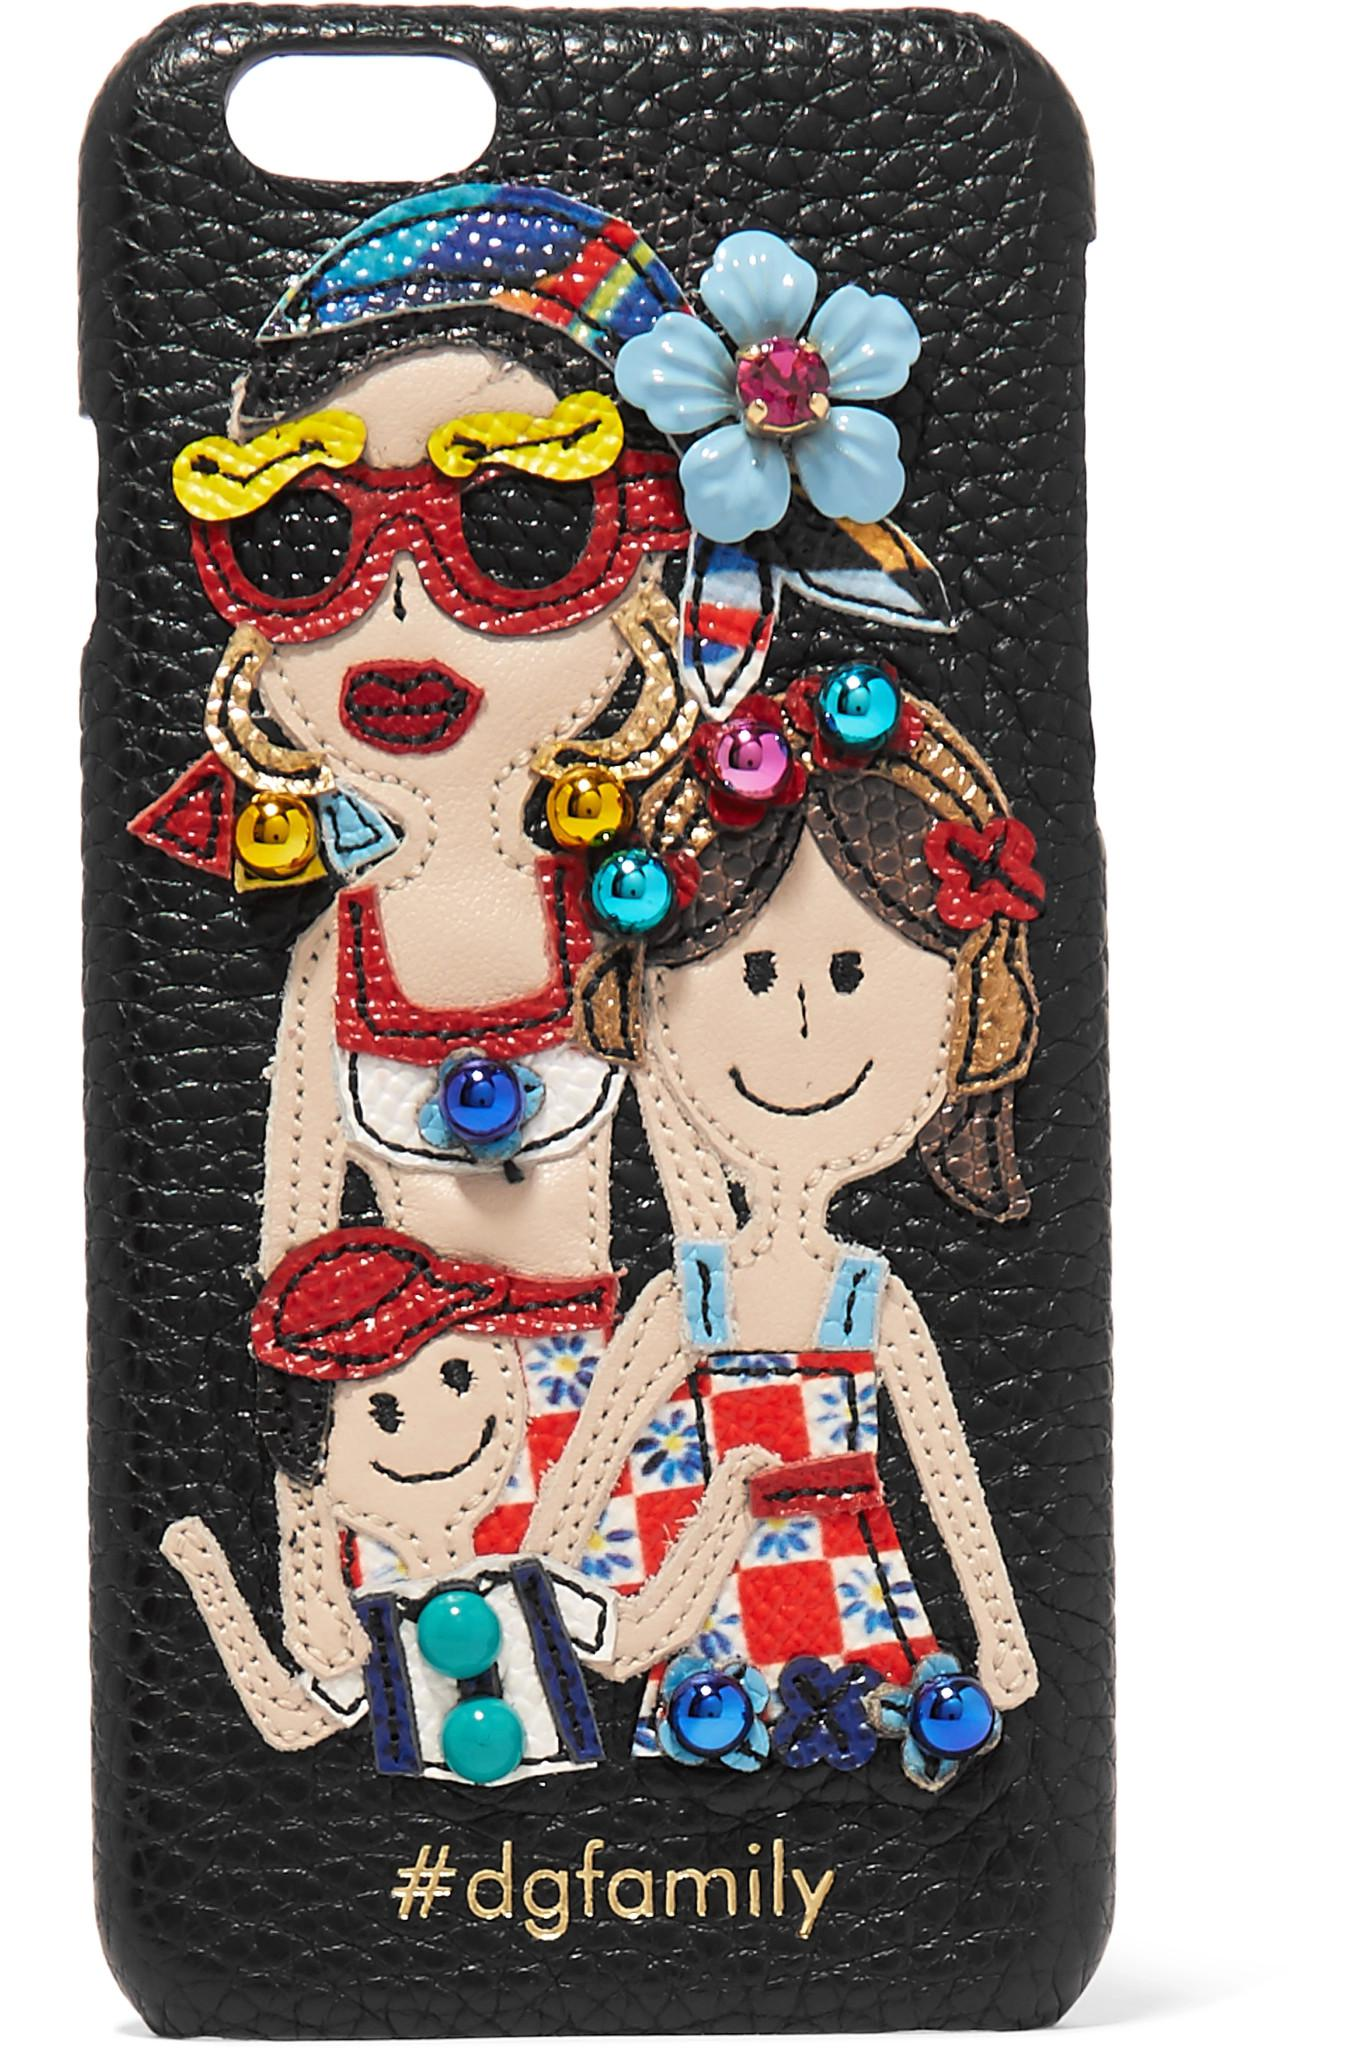 Nice Vente En Ligne Choisir Un Meilleur Dolce & Gabbana Embelli Cuir Texturé Appliquéd Iphone 7 - Noir Vente Bas Prix lAtzuWq8rN